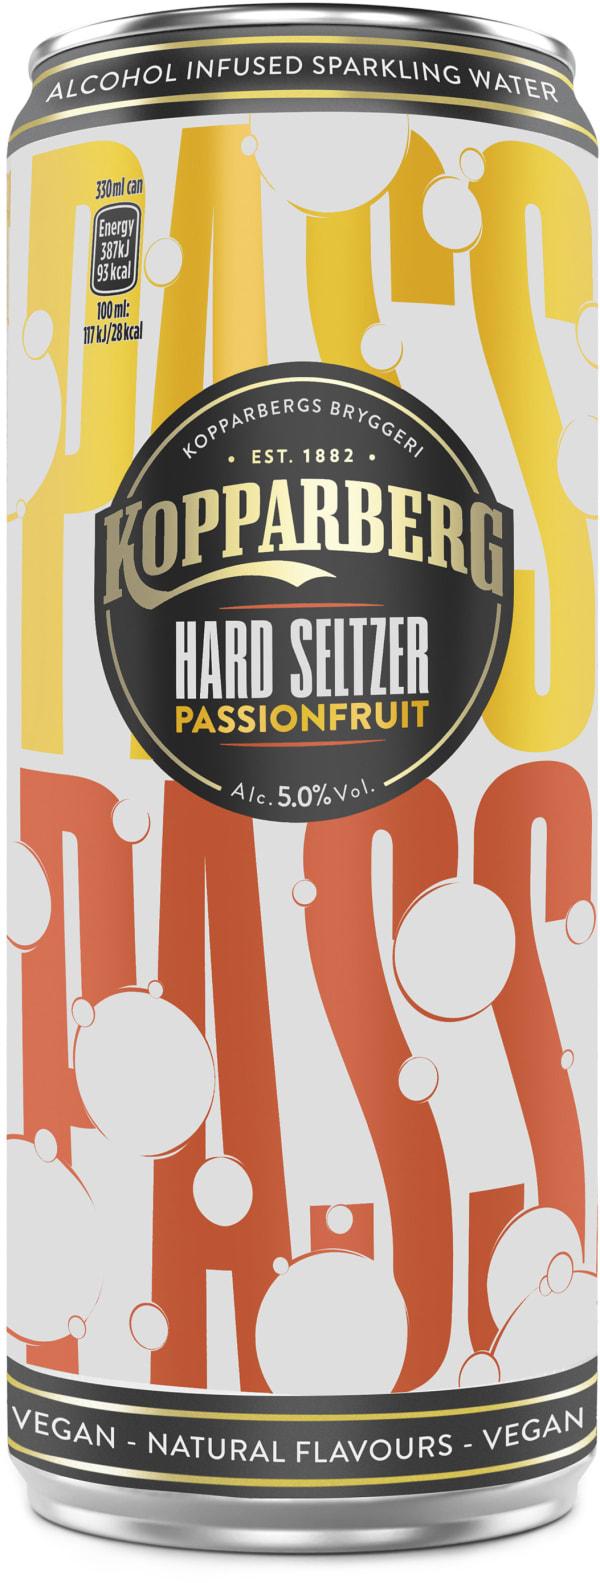 Kopparberg Hard Seltzer Passionfruit can